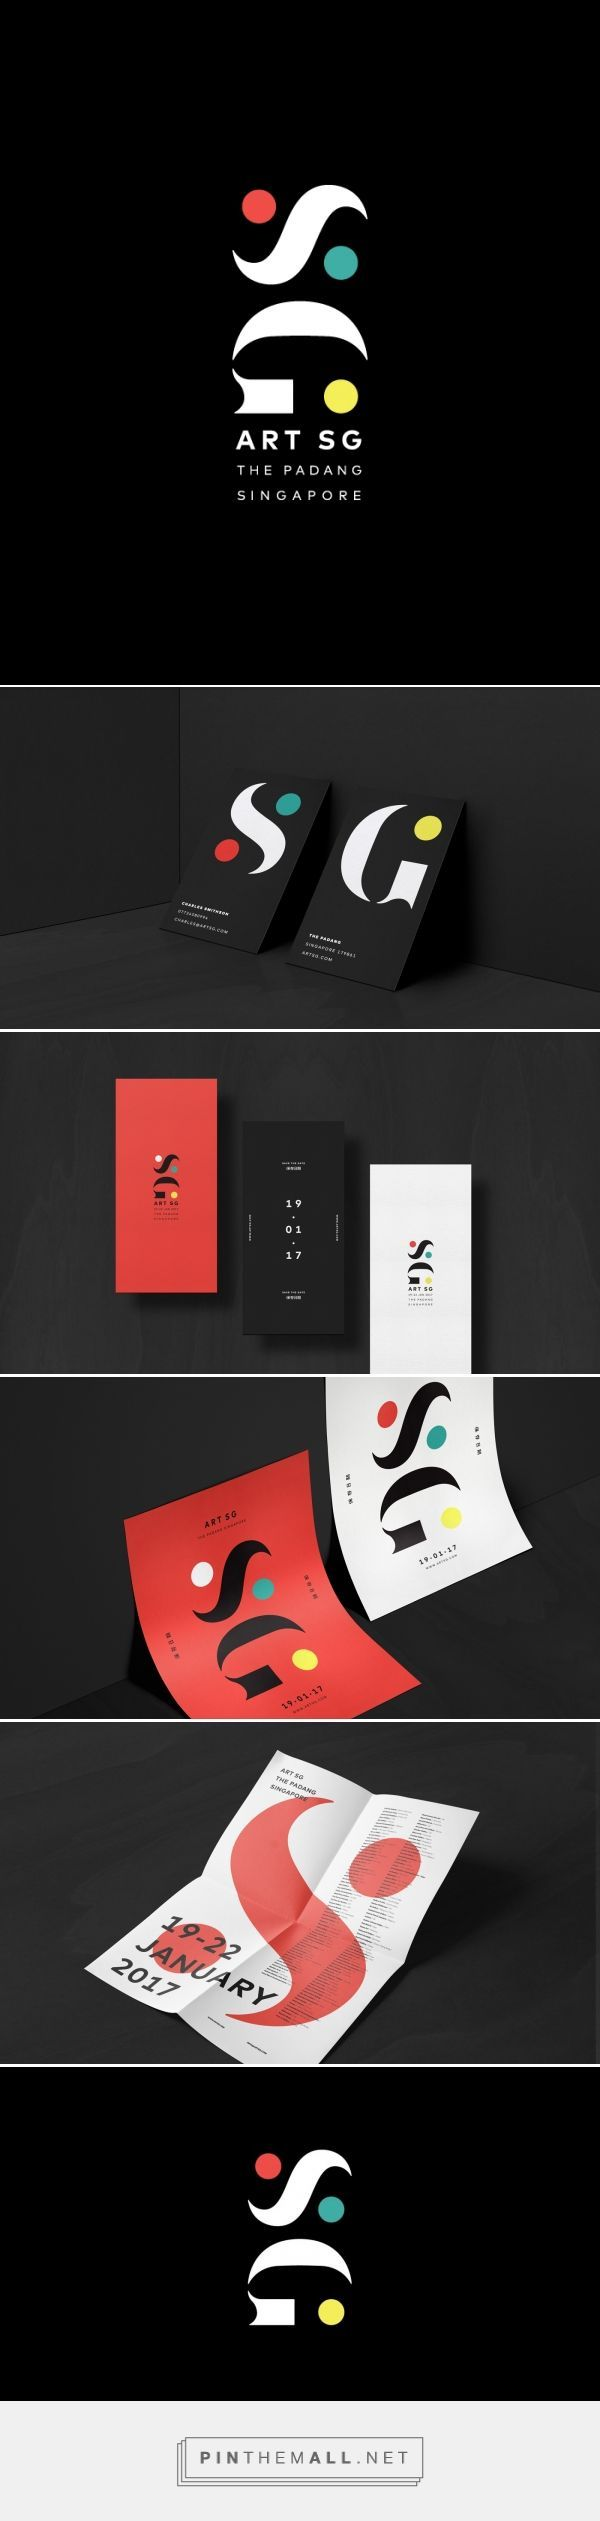 Art SG Branding by The Plant | Fivestar Branding – Design and Branding Agency & Inspiration Gallery